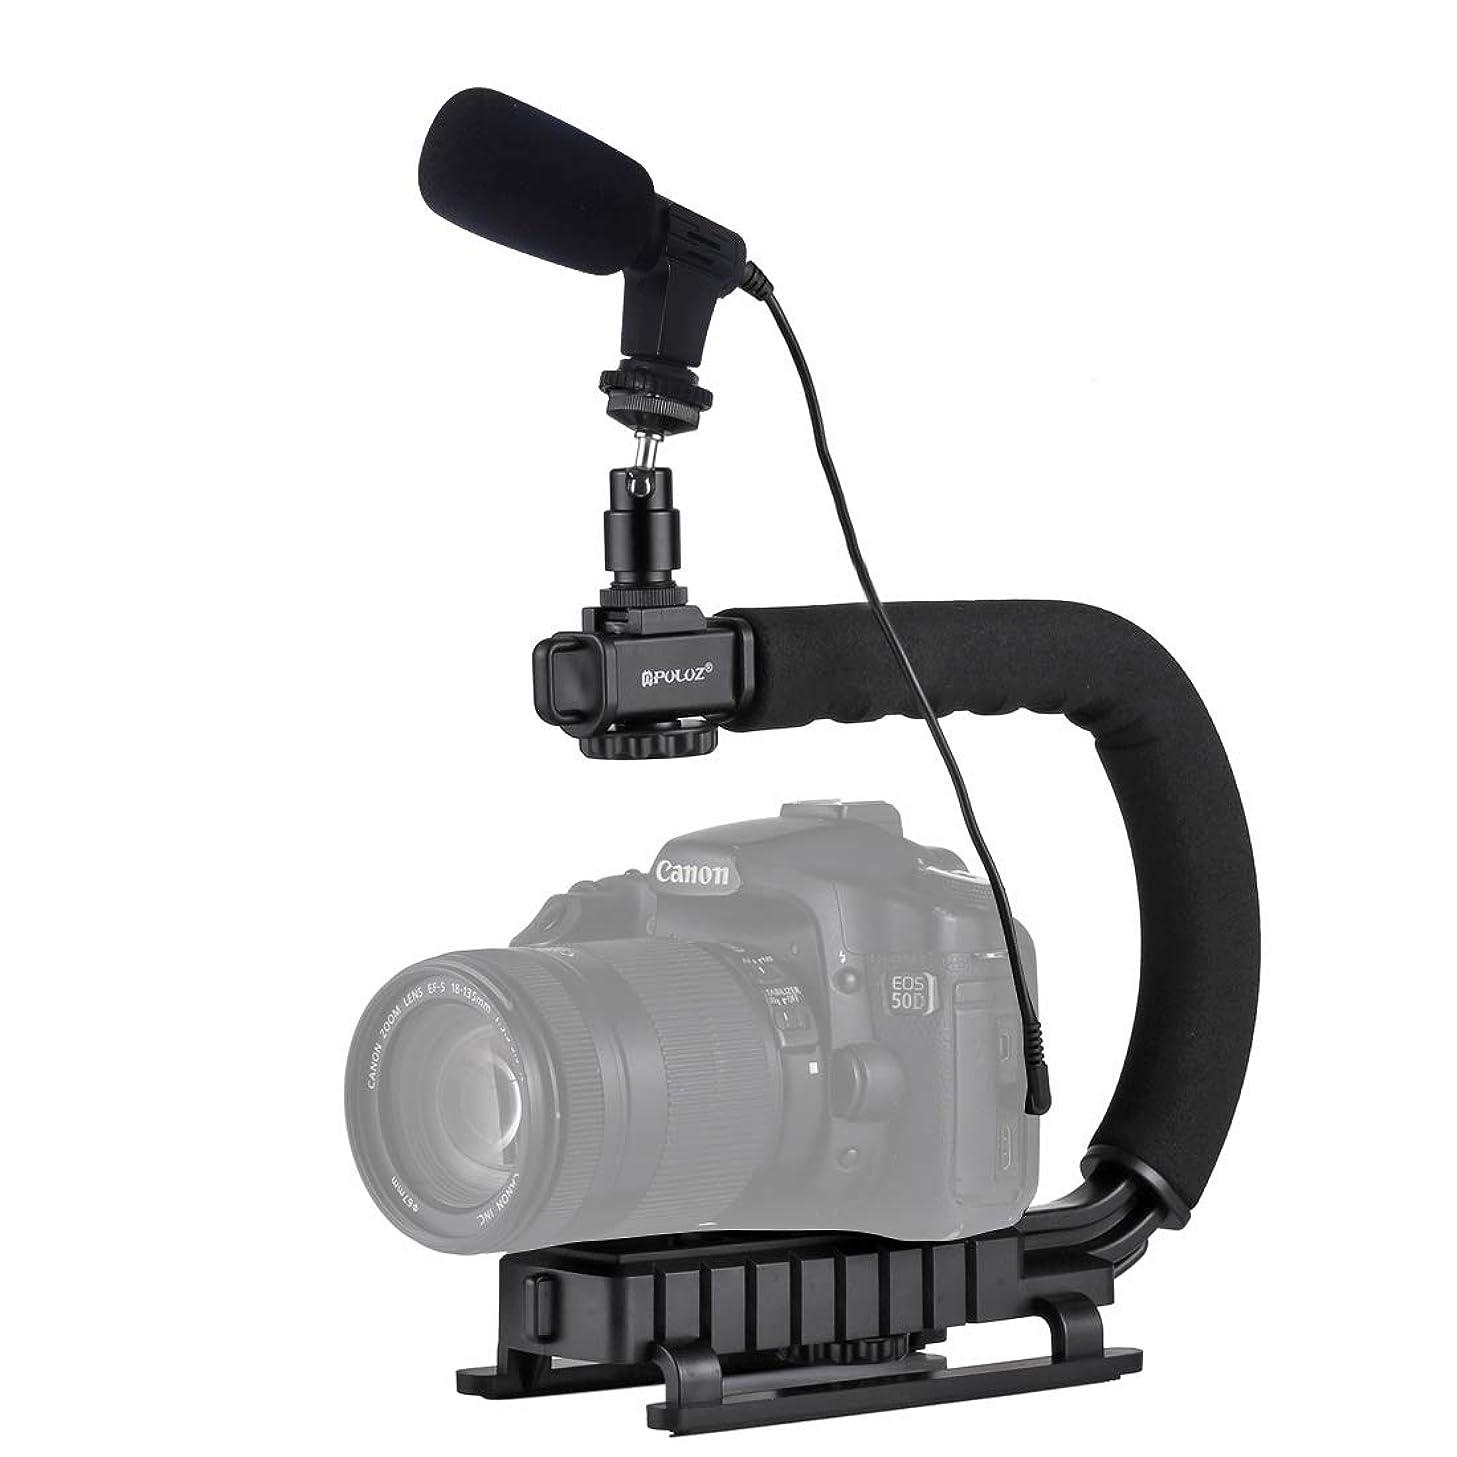 Aosituopu Camera Stabilizer Camera Stabilizer U/C Shape Portable Handheld DV Bracket Stabilizer + Video Shotgun Microphone Kit with Cold Shoe Tripod Head for All SLR Cameras and Home DV Camera